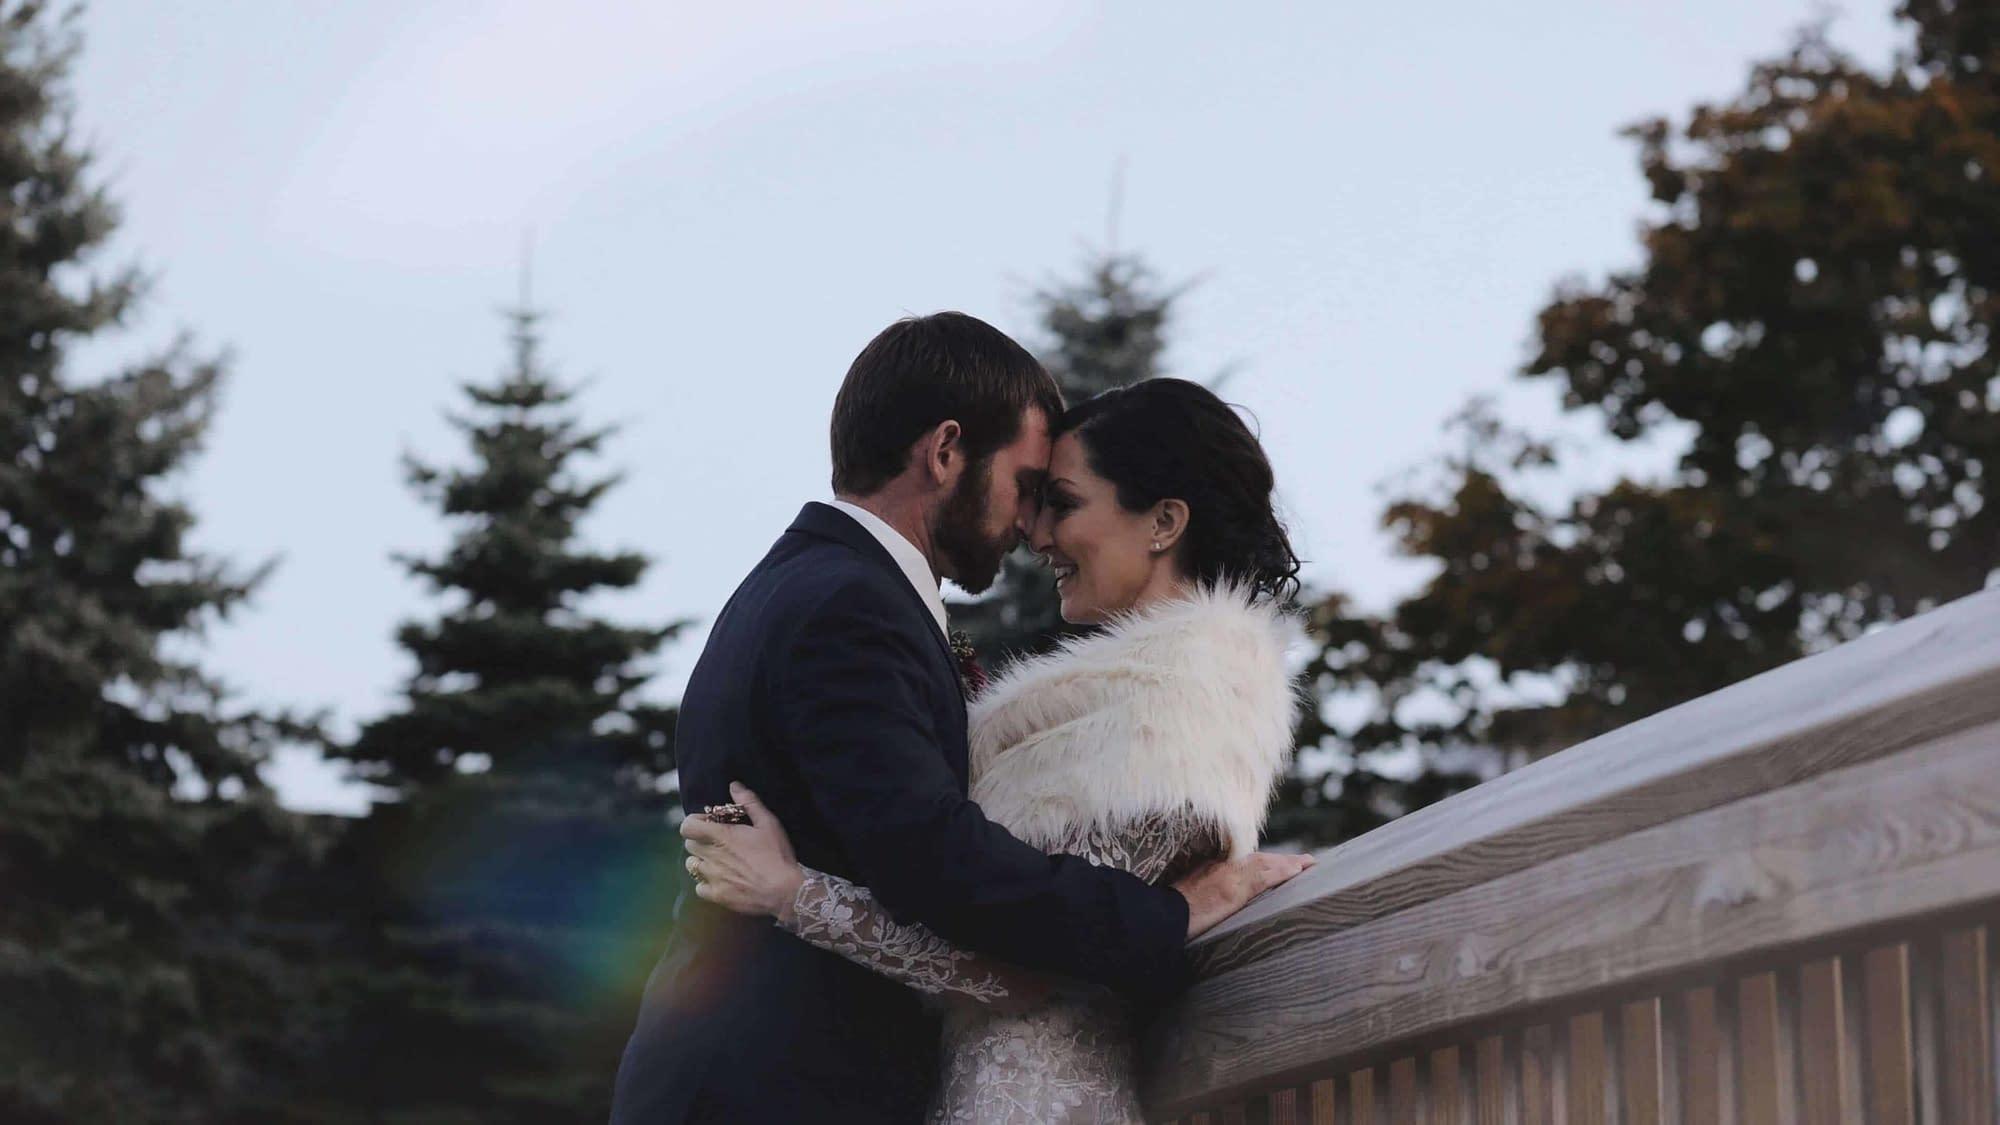 BOston wedding videographer